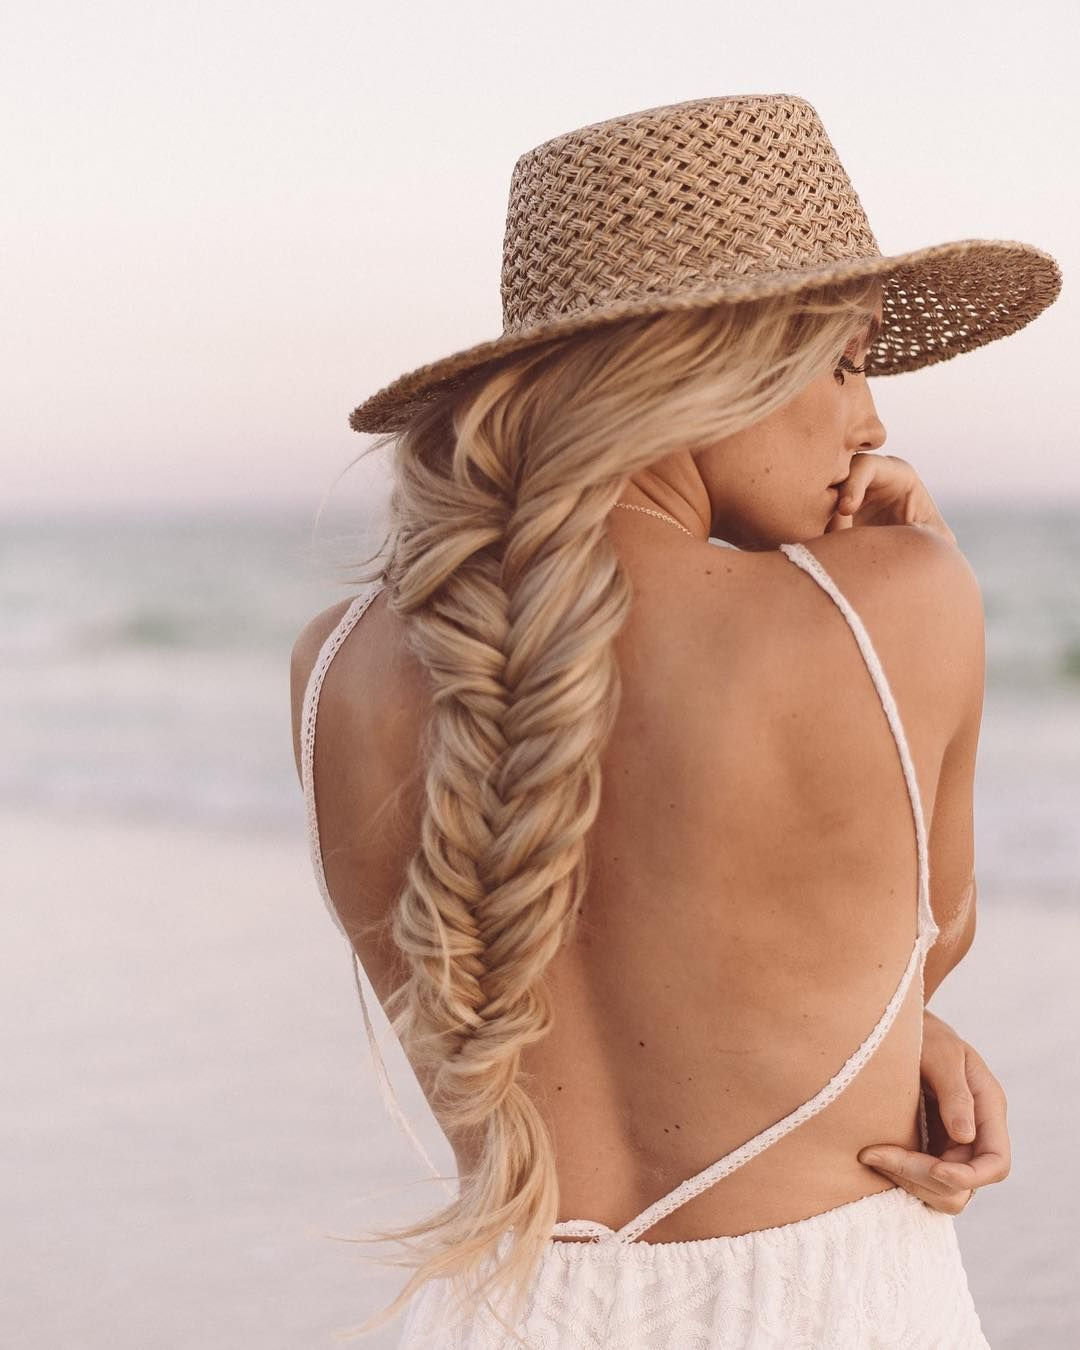 Beach braid 🌊 @alexisjadekaiser w/ @bombshellextensions 🌈